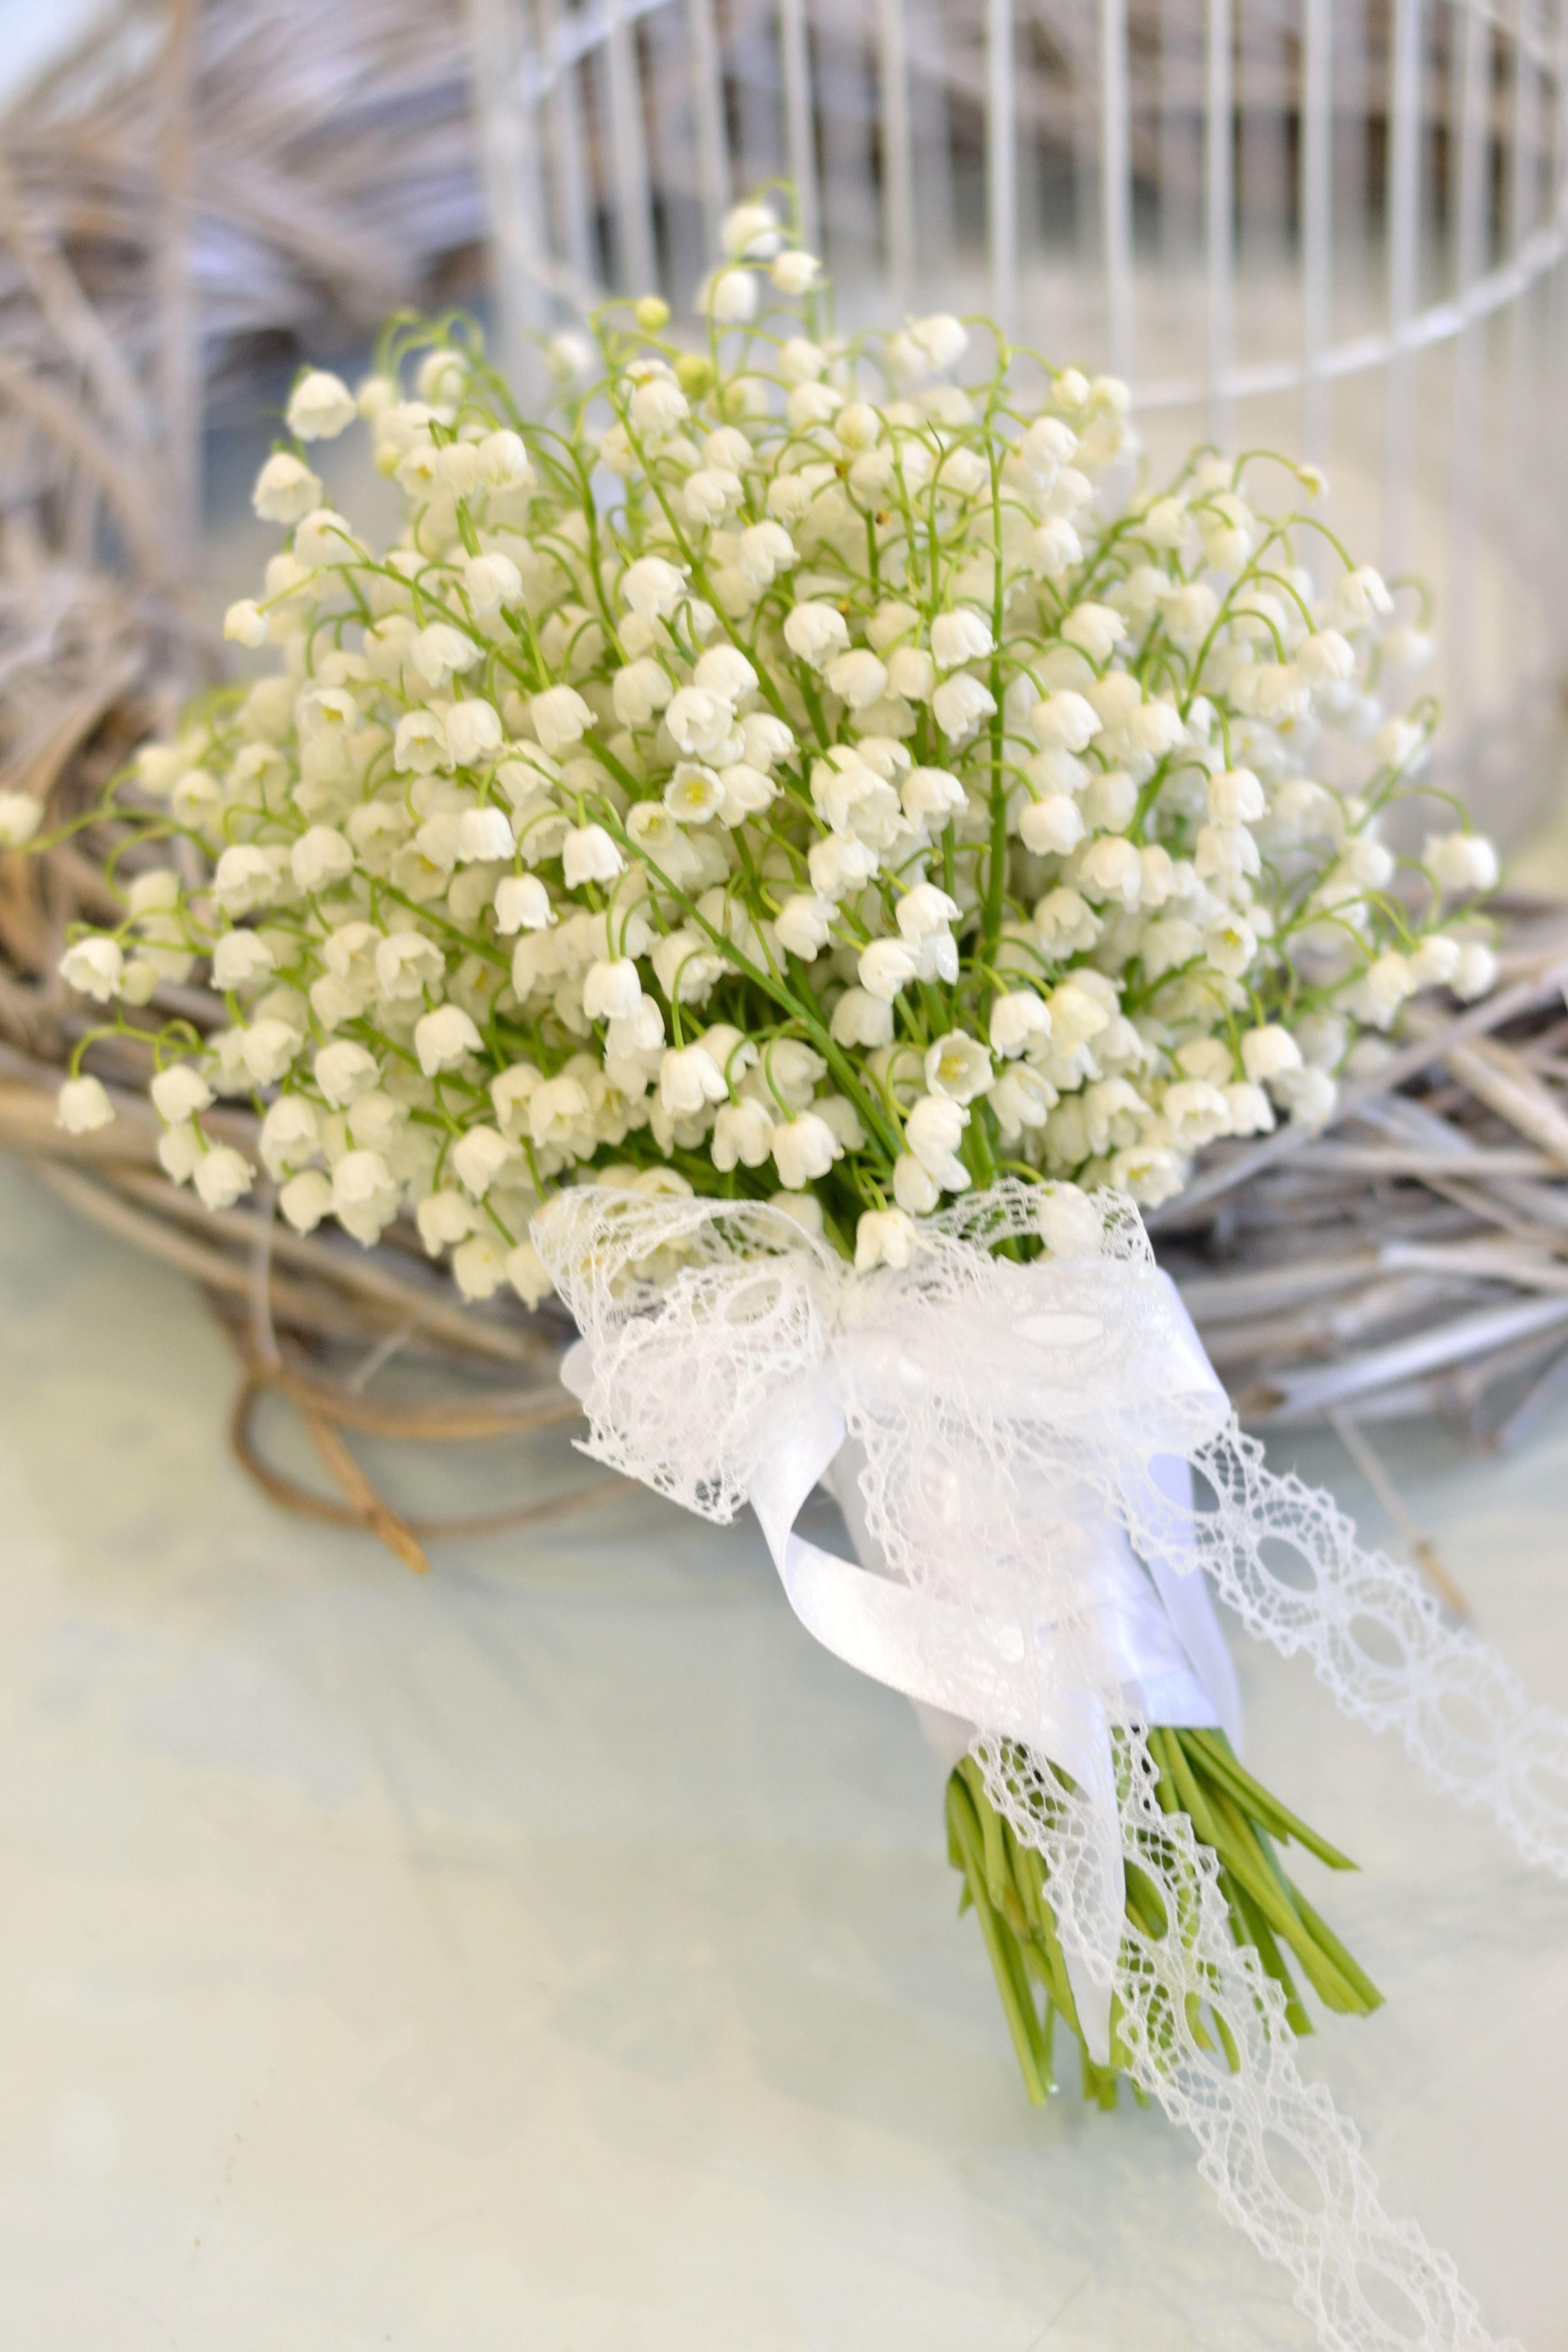 Lily of the Valley wedding bouquet / Vjenčani buket od